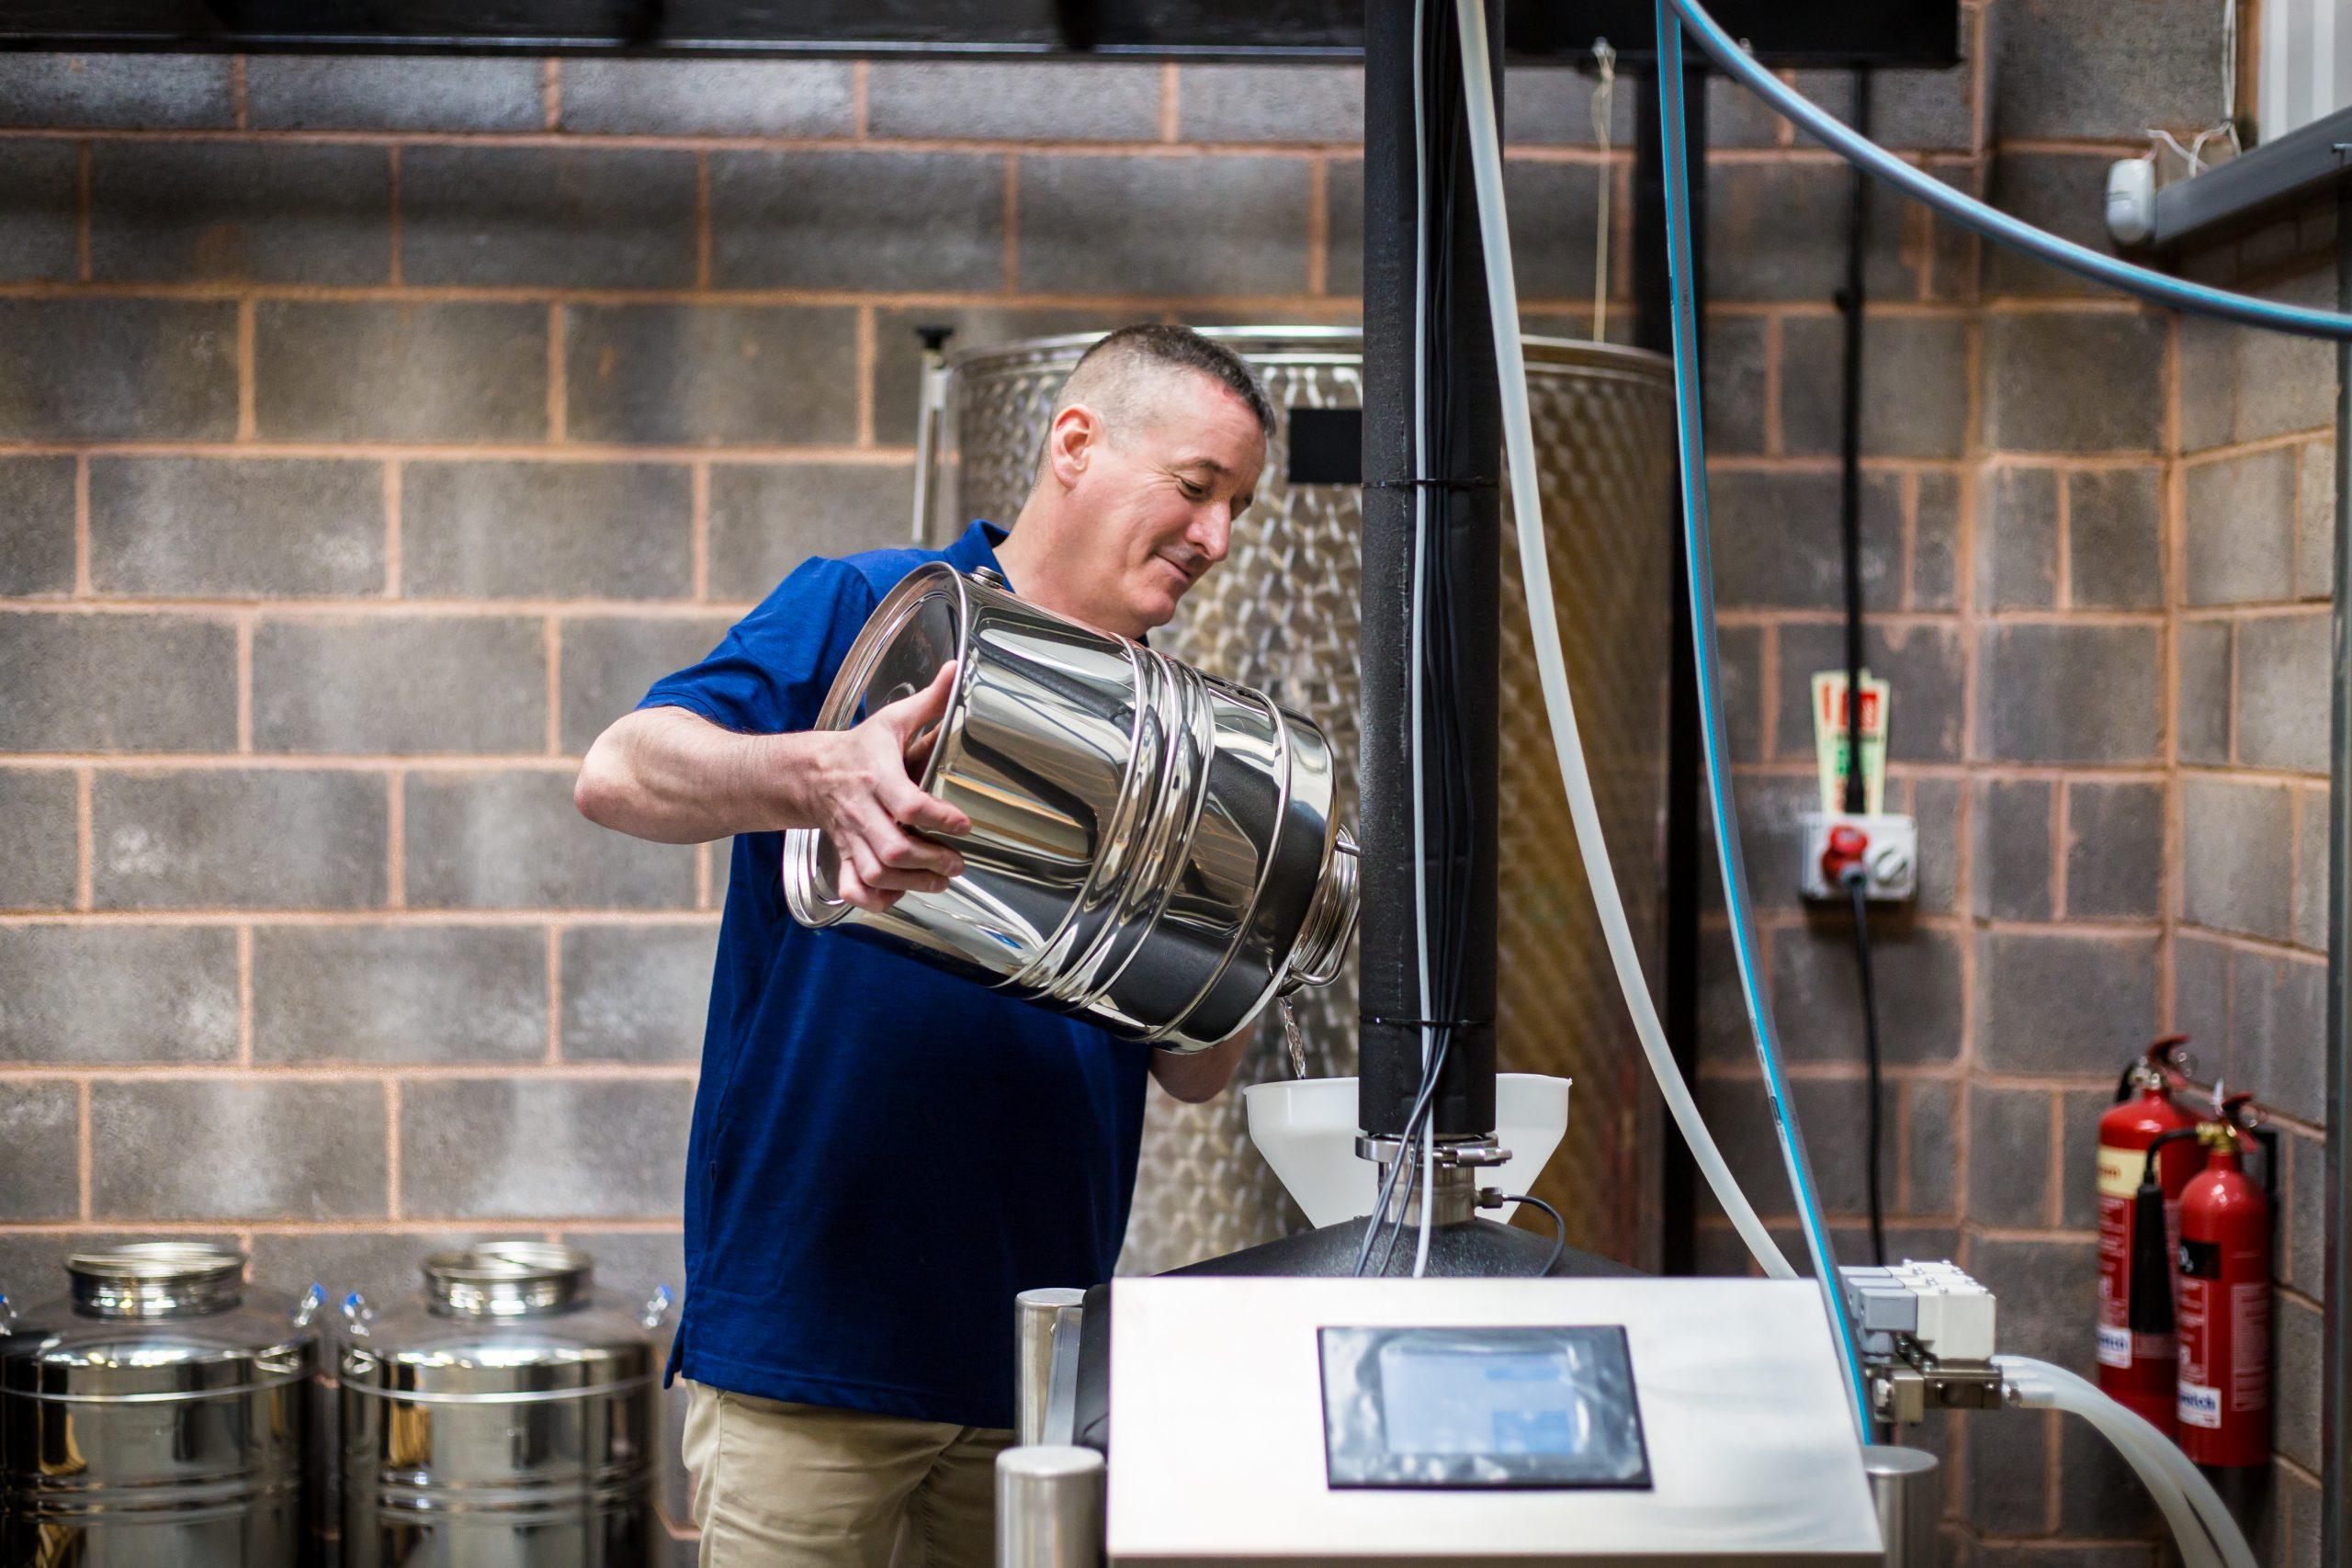 John working in the Distillery